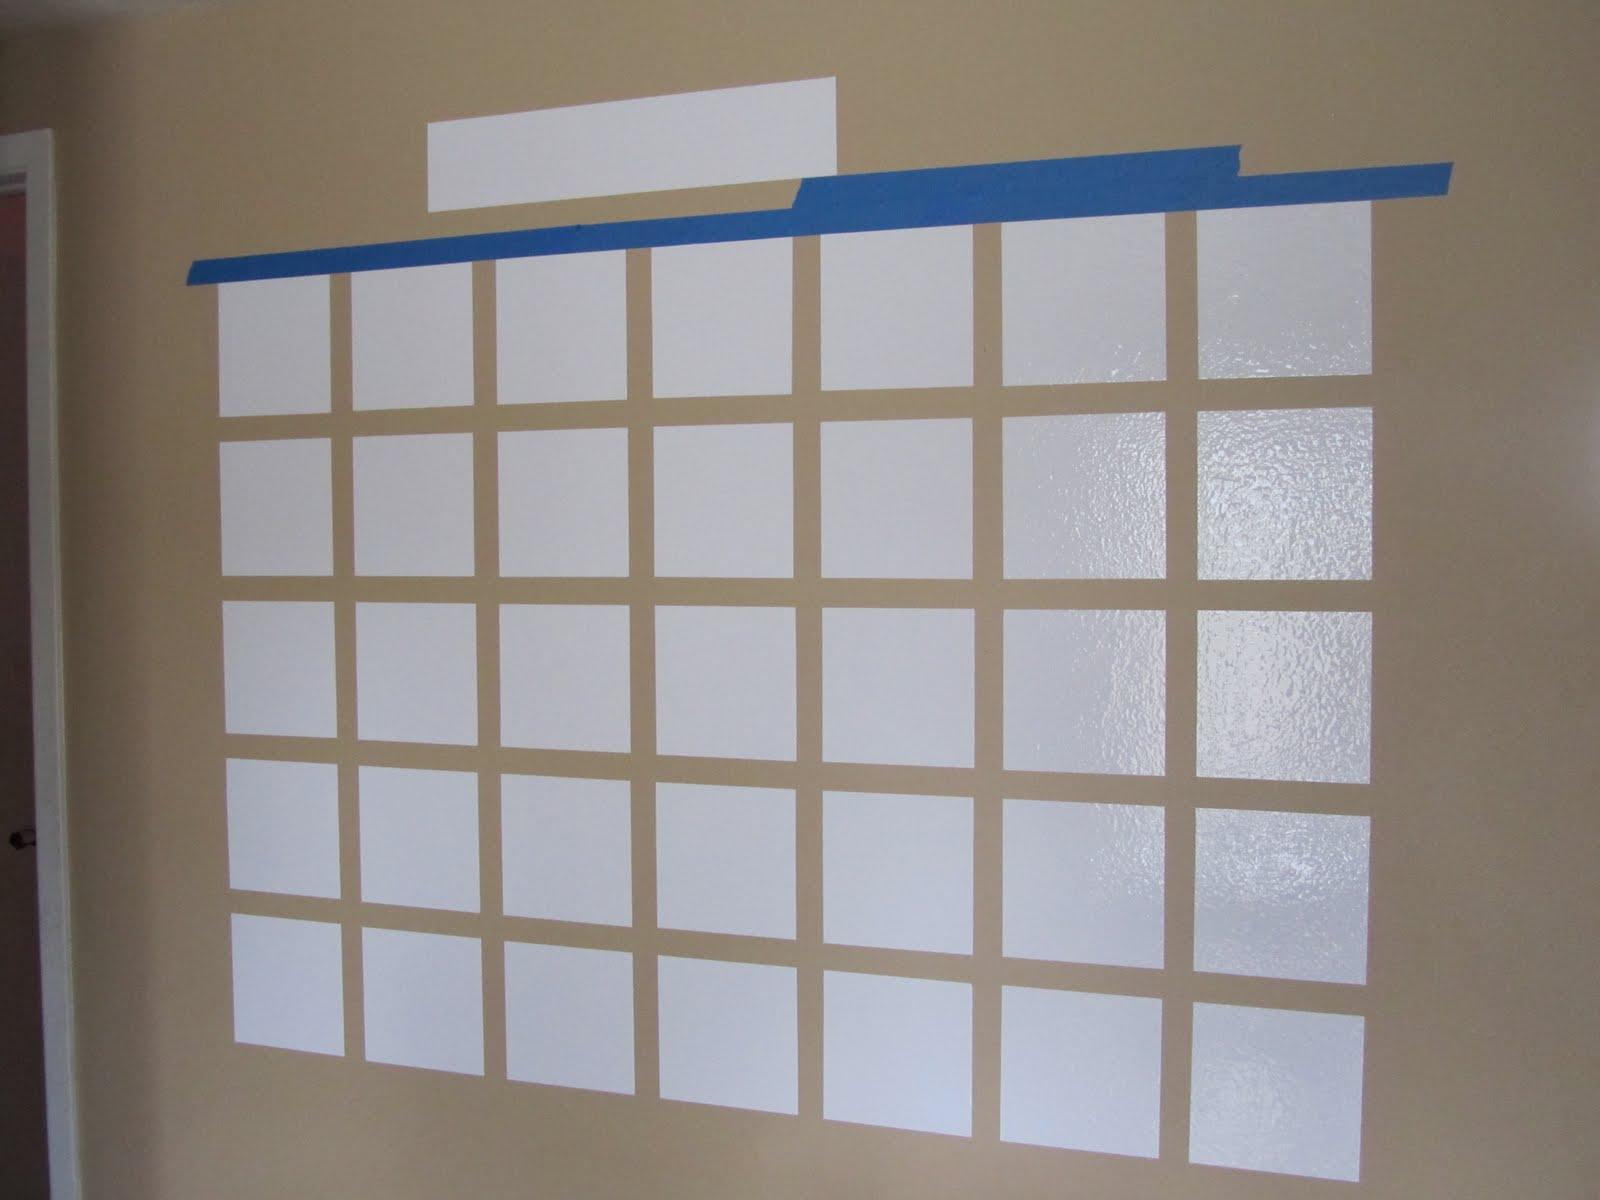 6 and still sane huge wall calendar tutorial 6 and still sane saigontimesfo